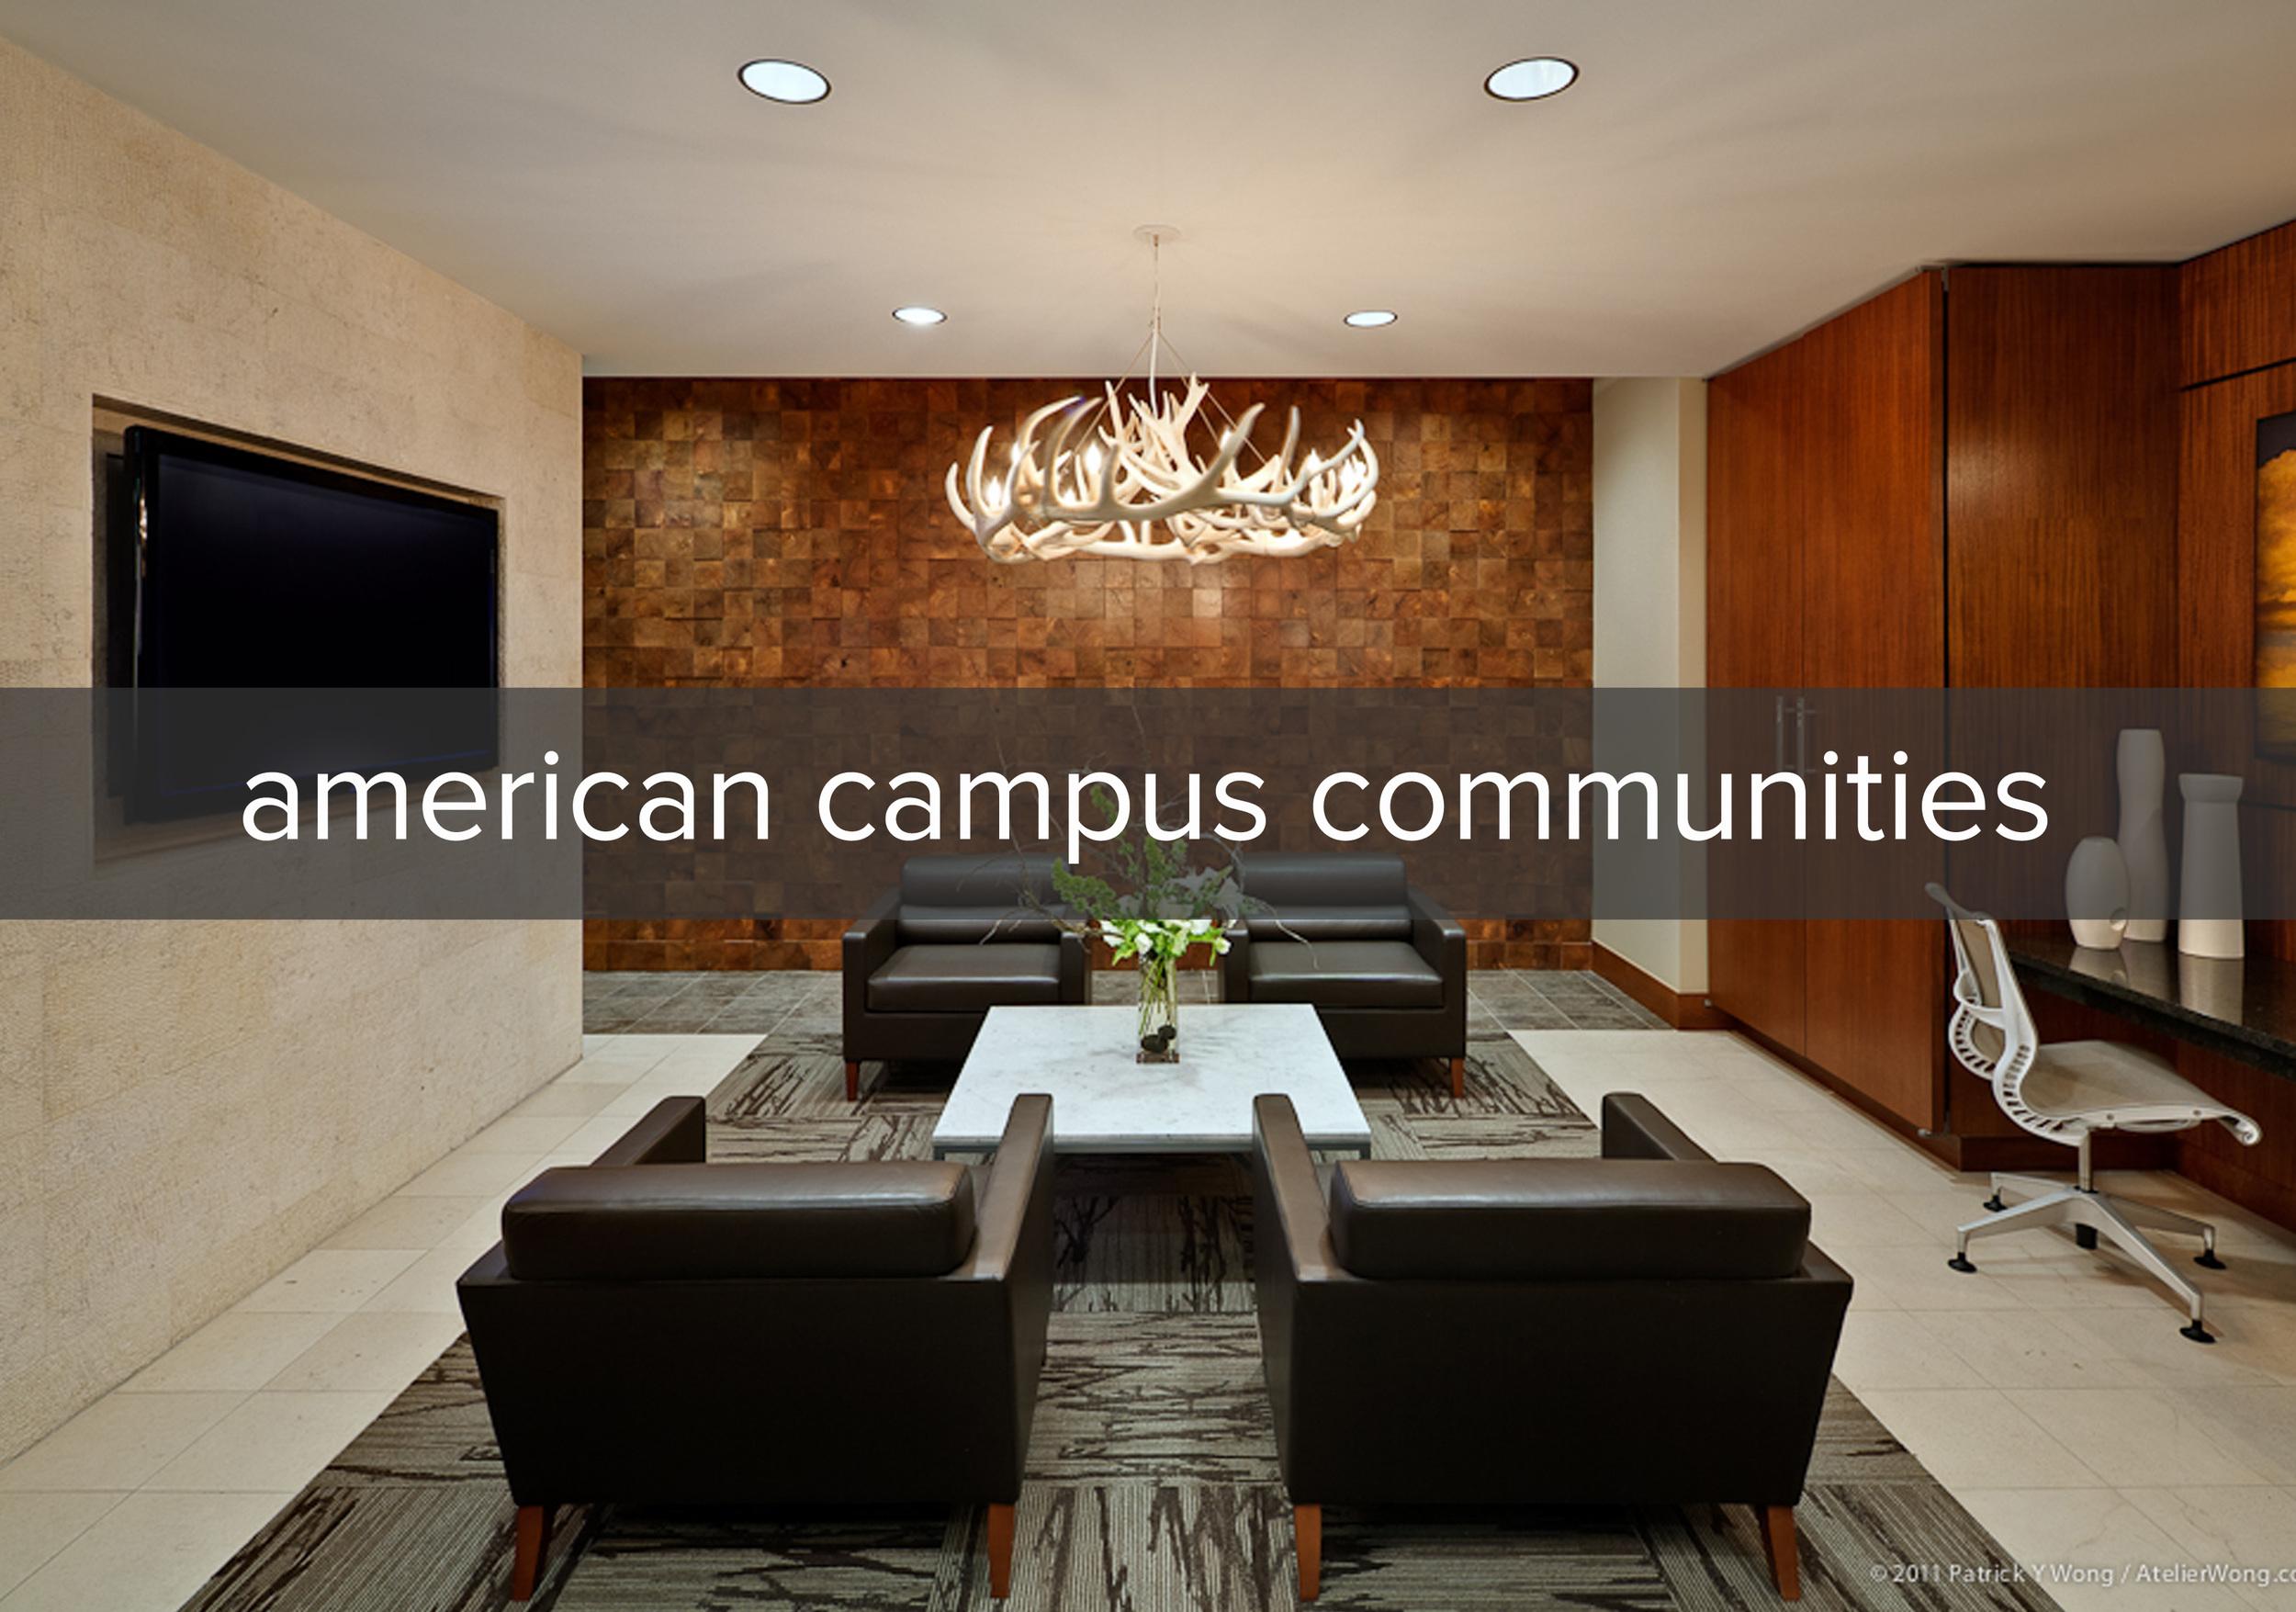 american campus communities.jpg